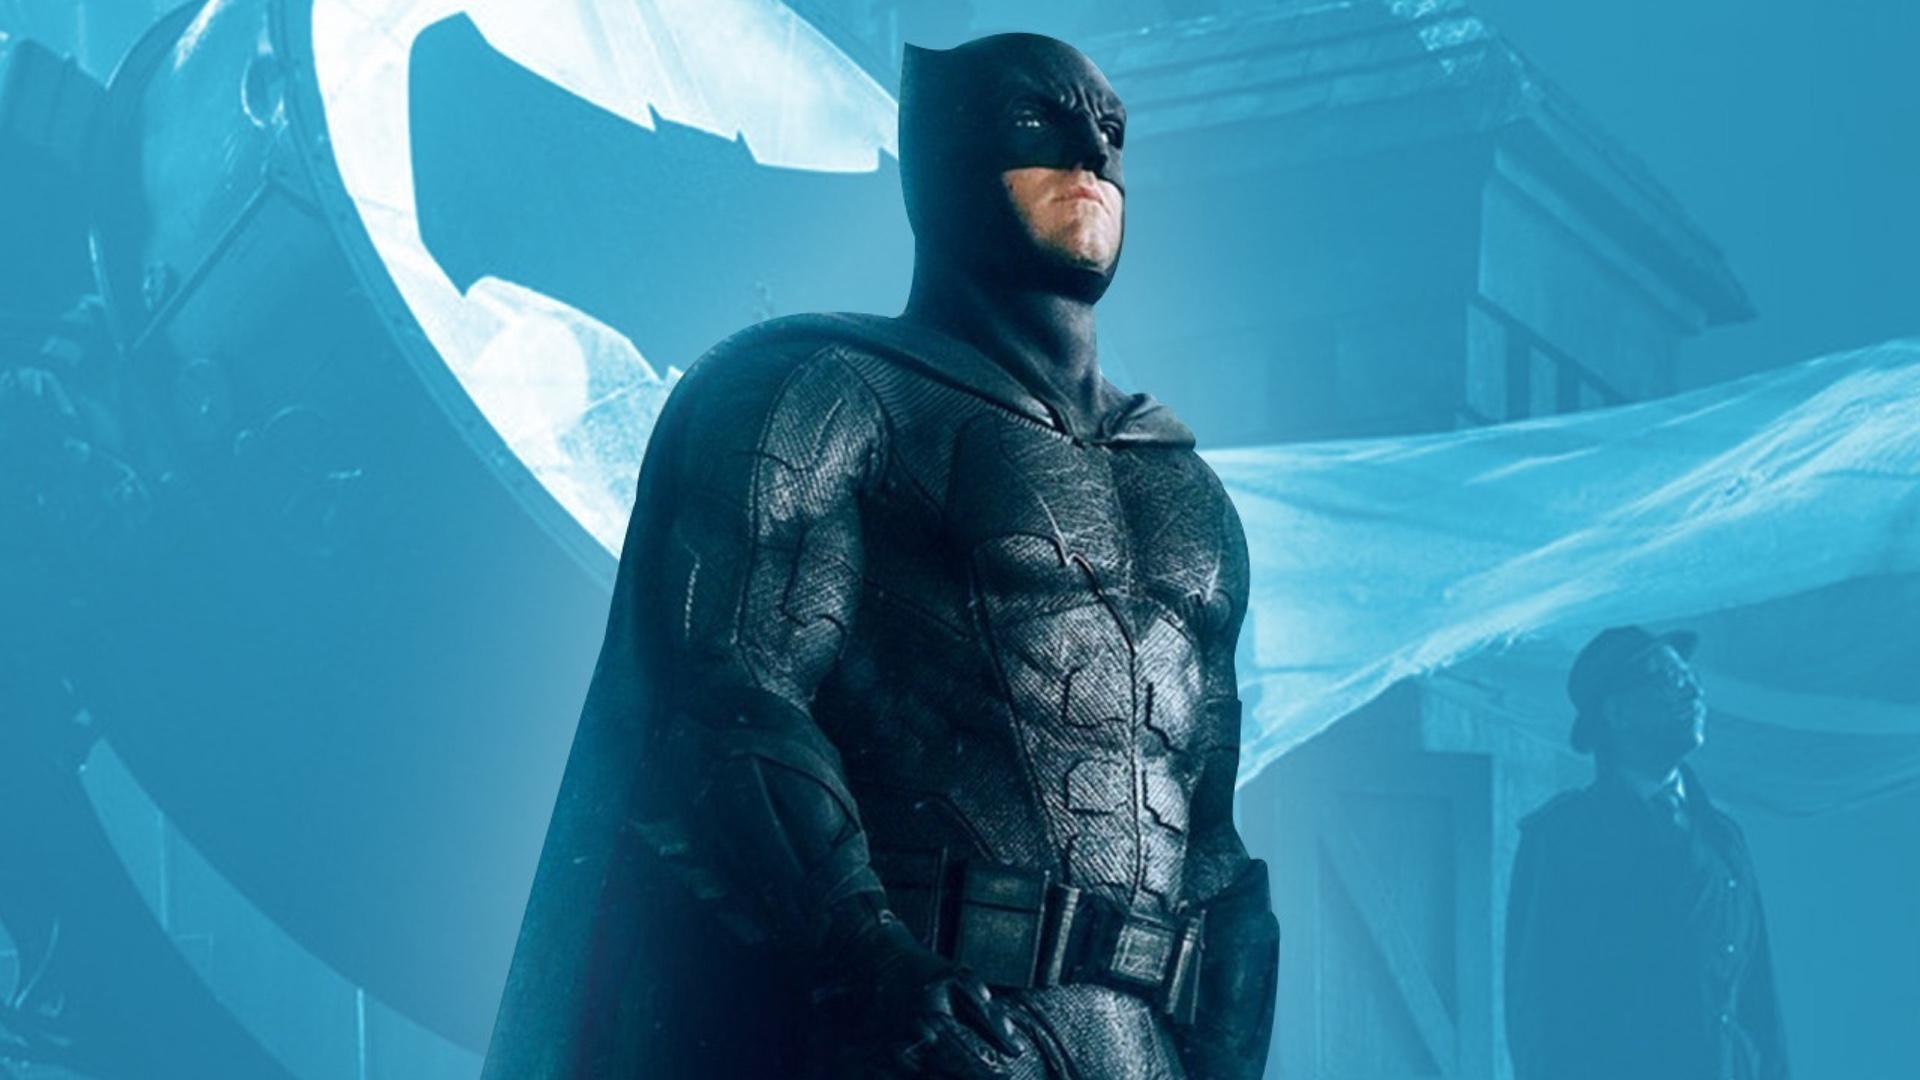 Бен Аффлек больше не будет играть Бэтмена